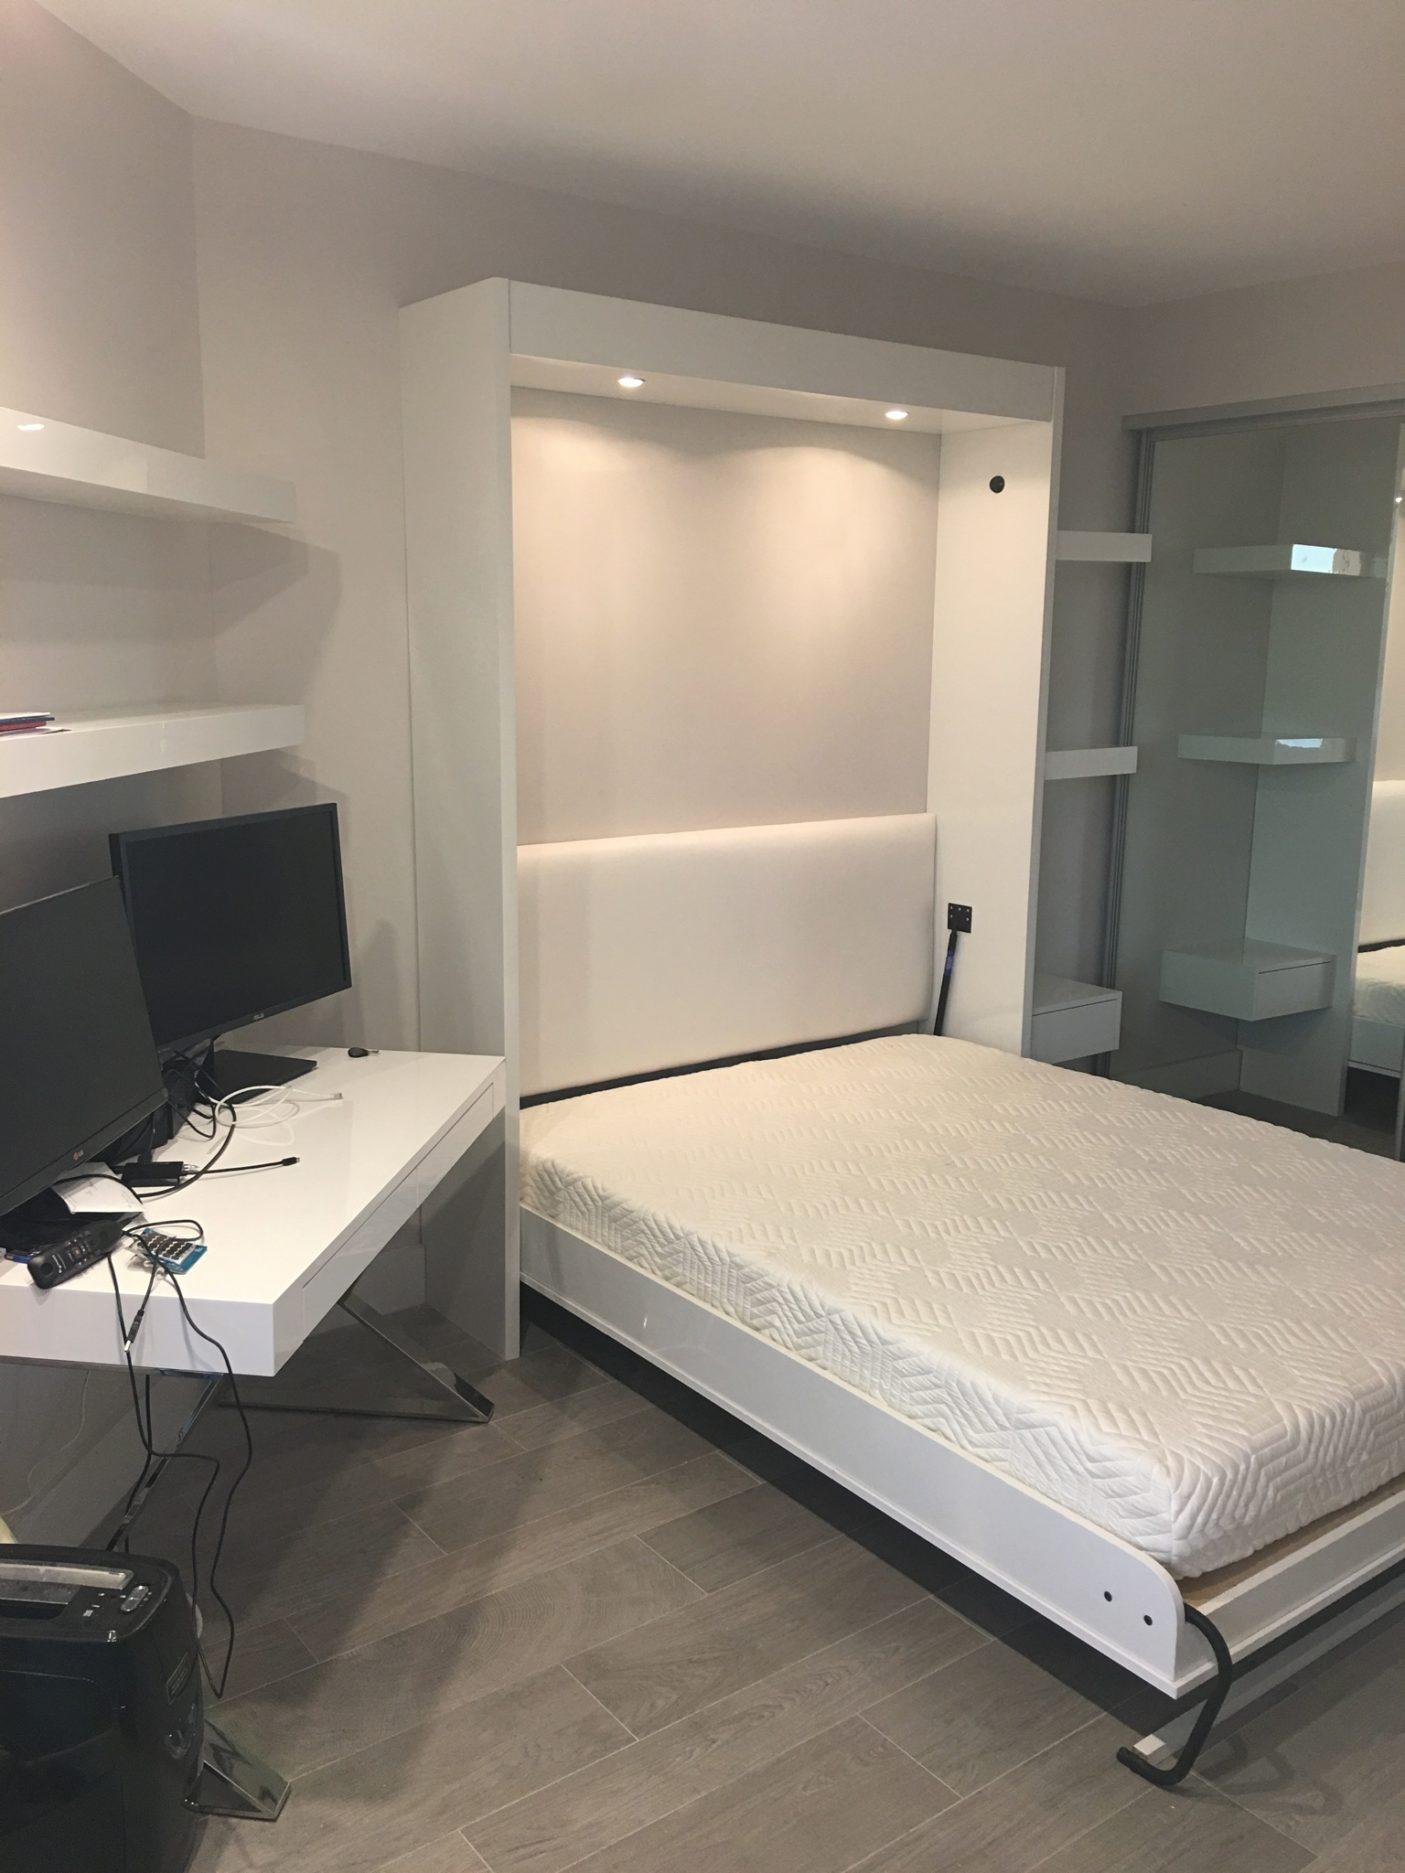 Bed-6.jpg